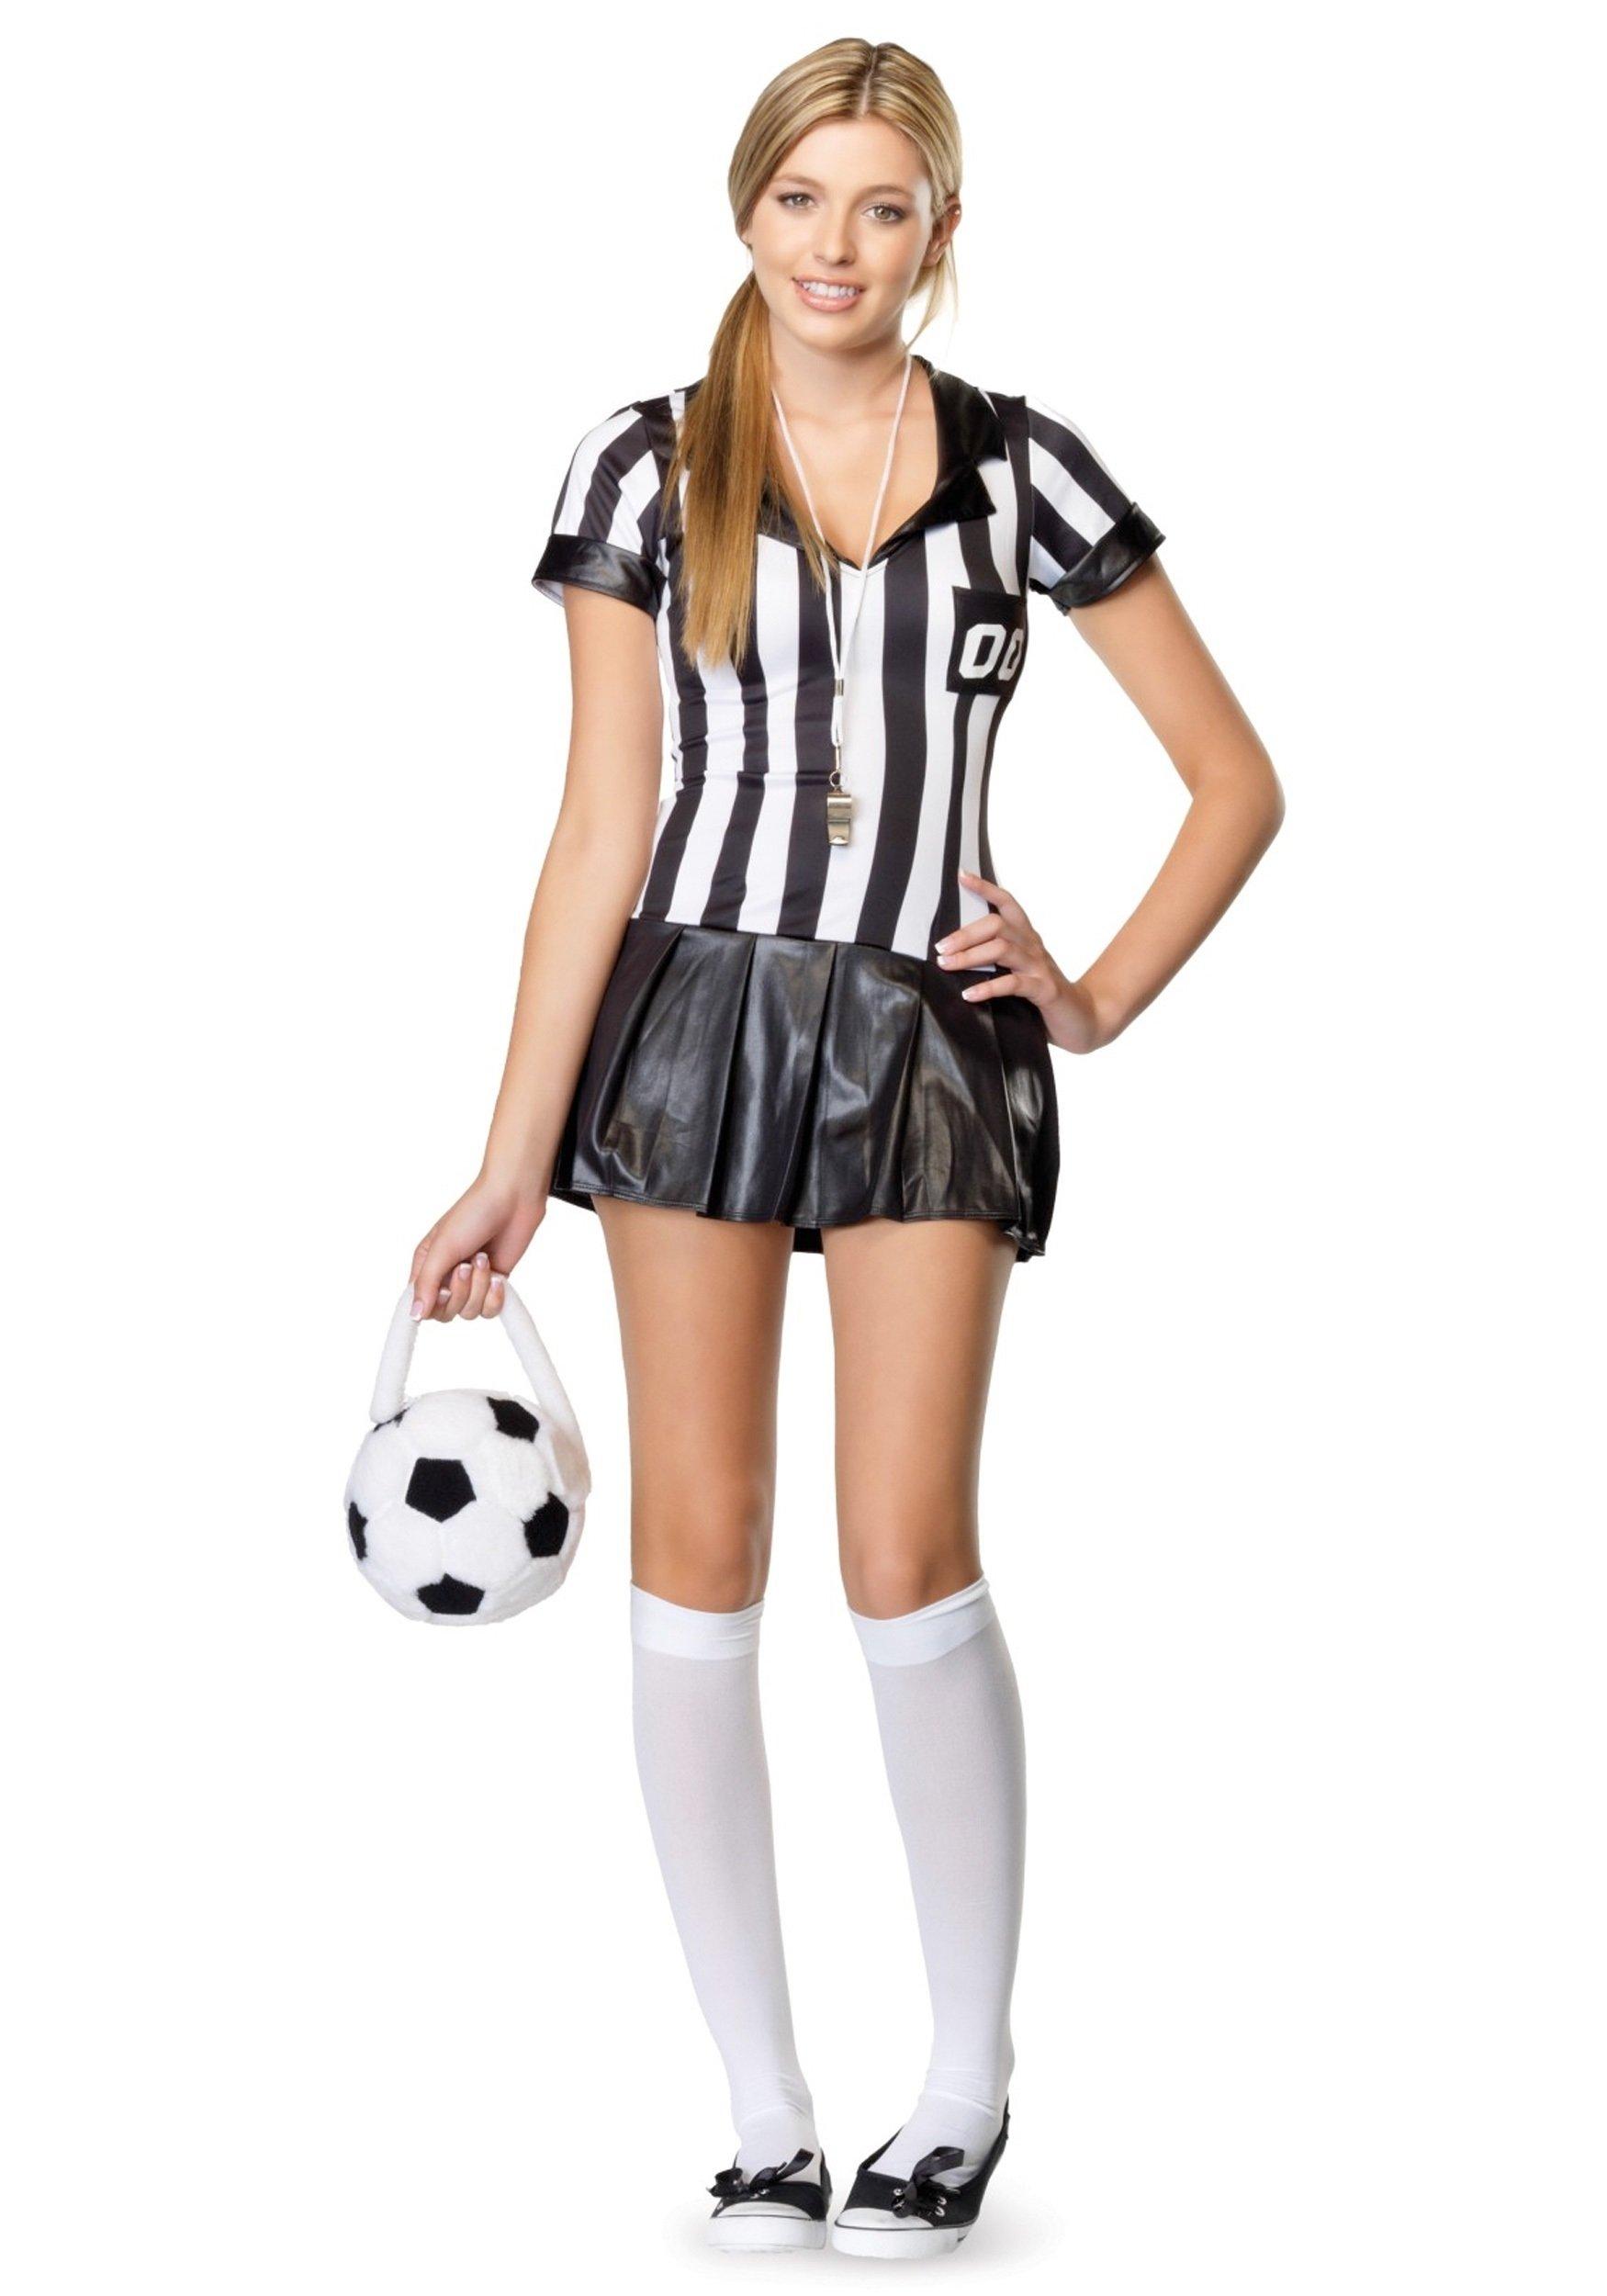 10 Wonderful Cool Halloween Costume Ideas For Girls cuteteencostumes home costume ideas sports costumes referee 6 2020